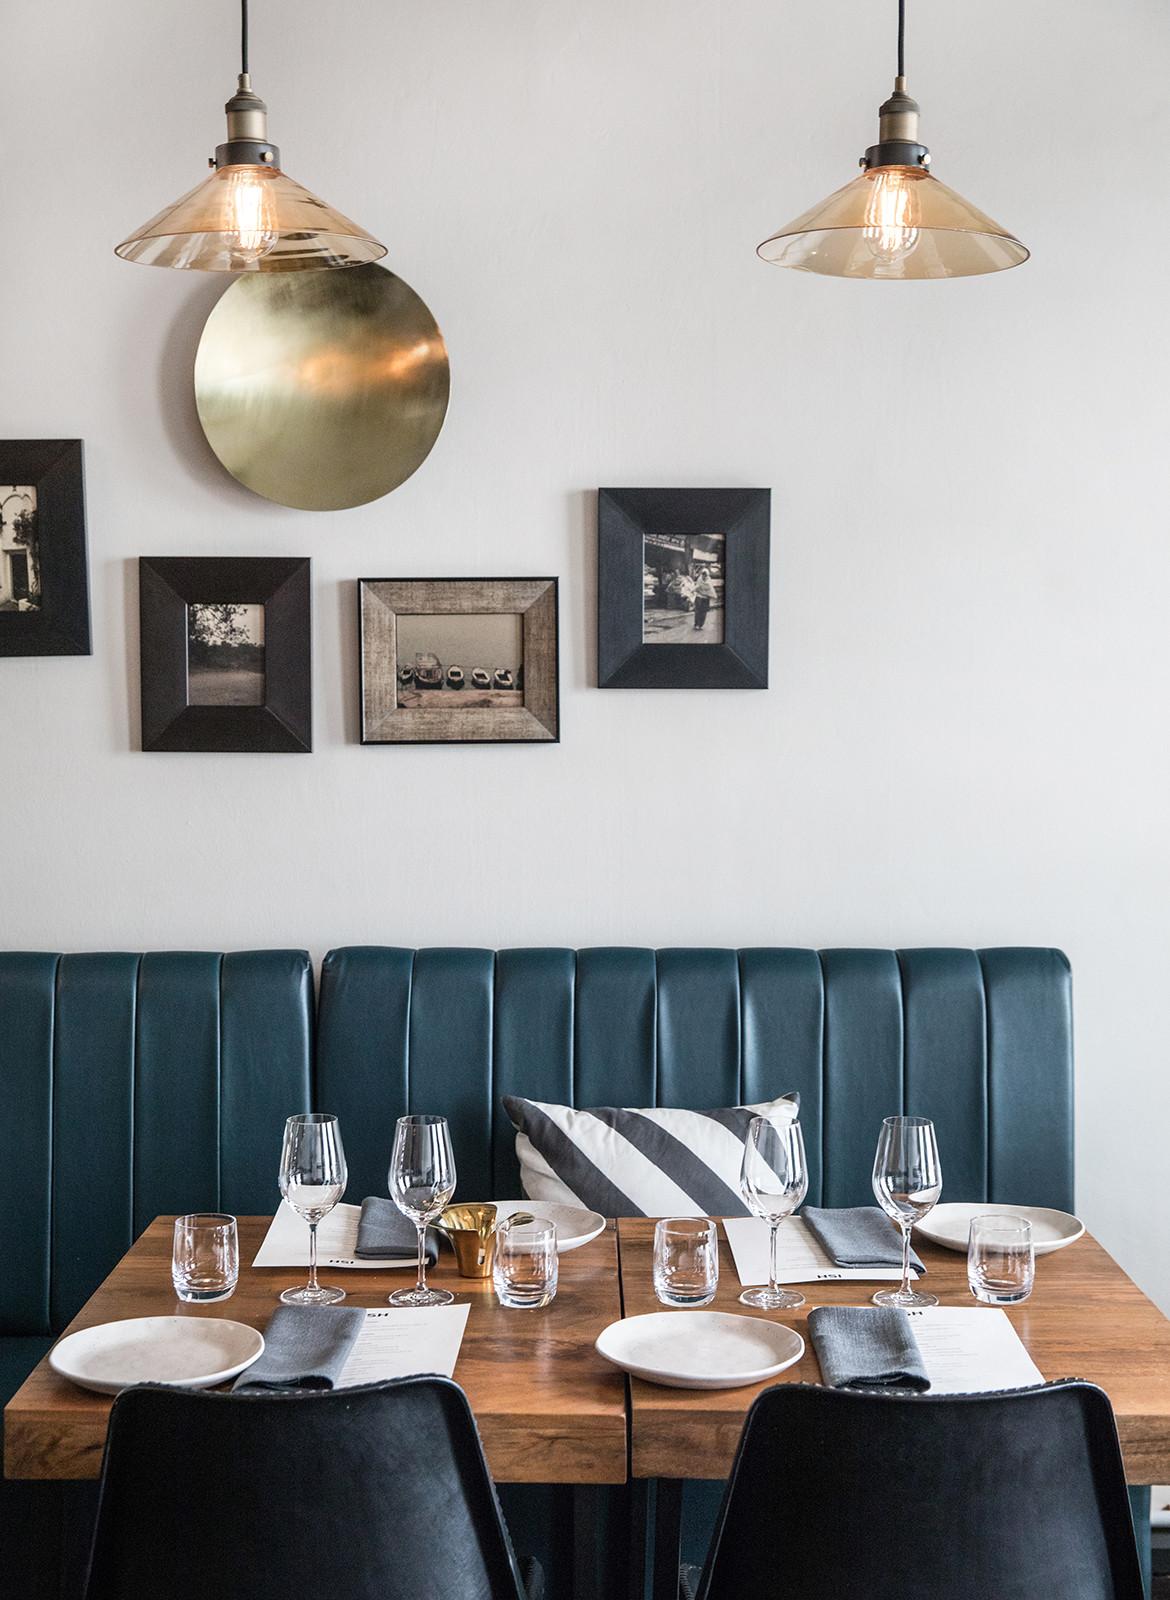 ISH Restaurant Melbourne Annu Bain CC Rhiannon Taylor dining details